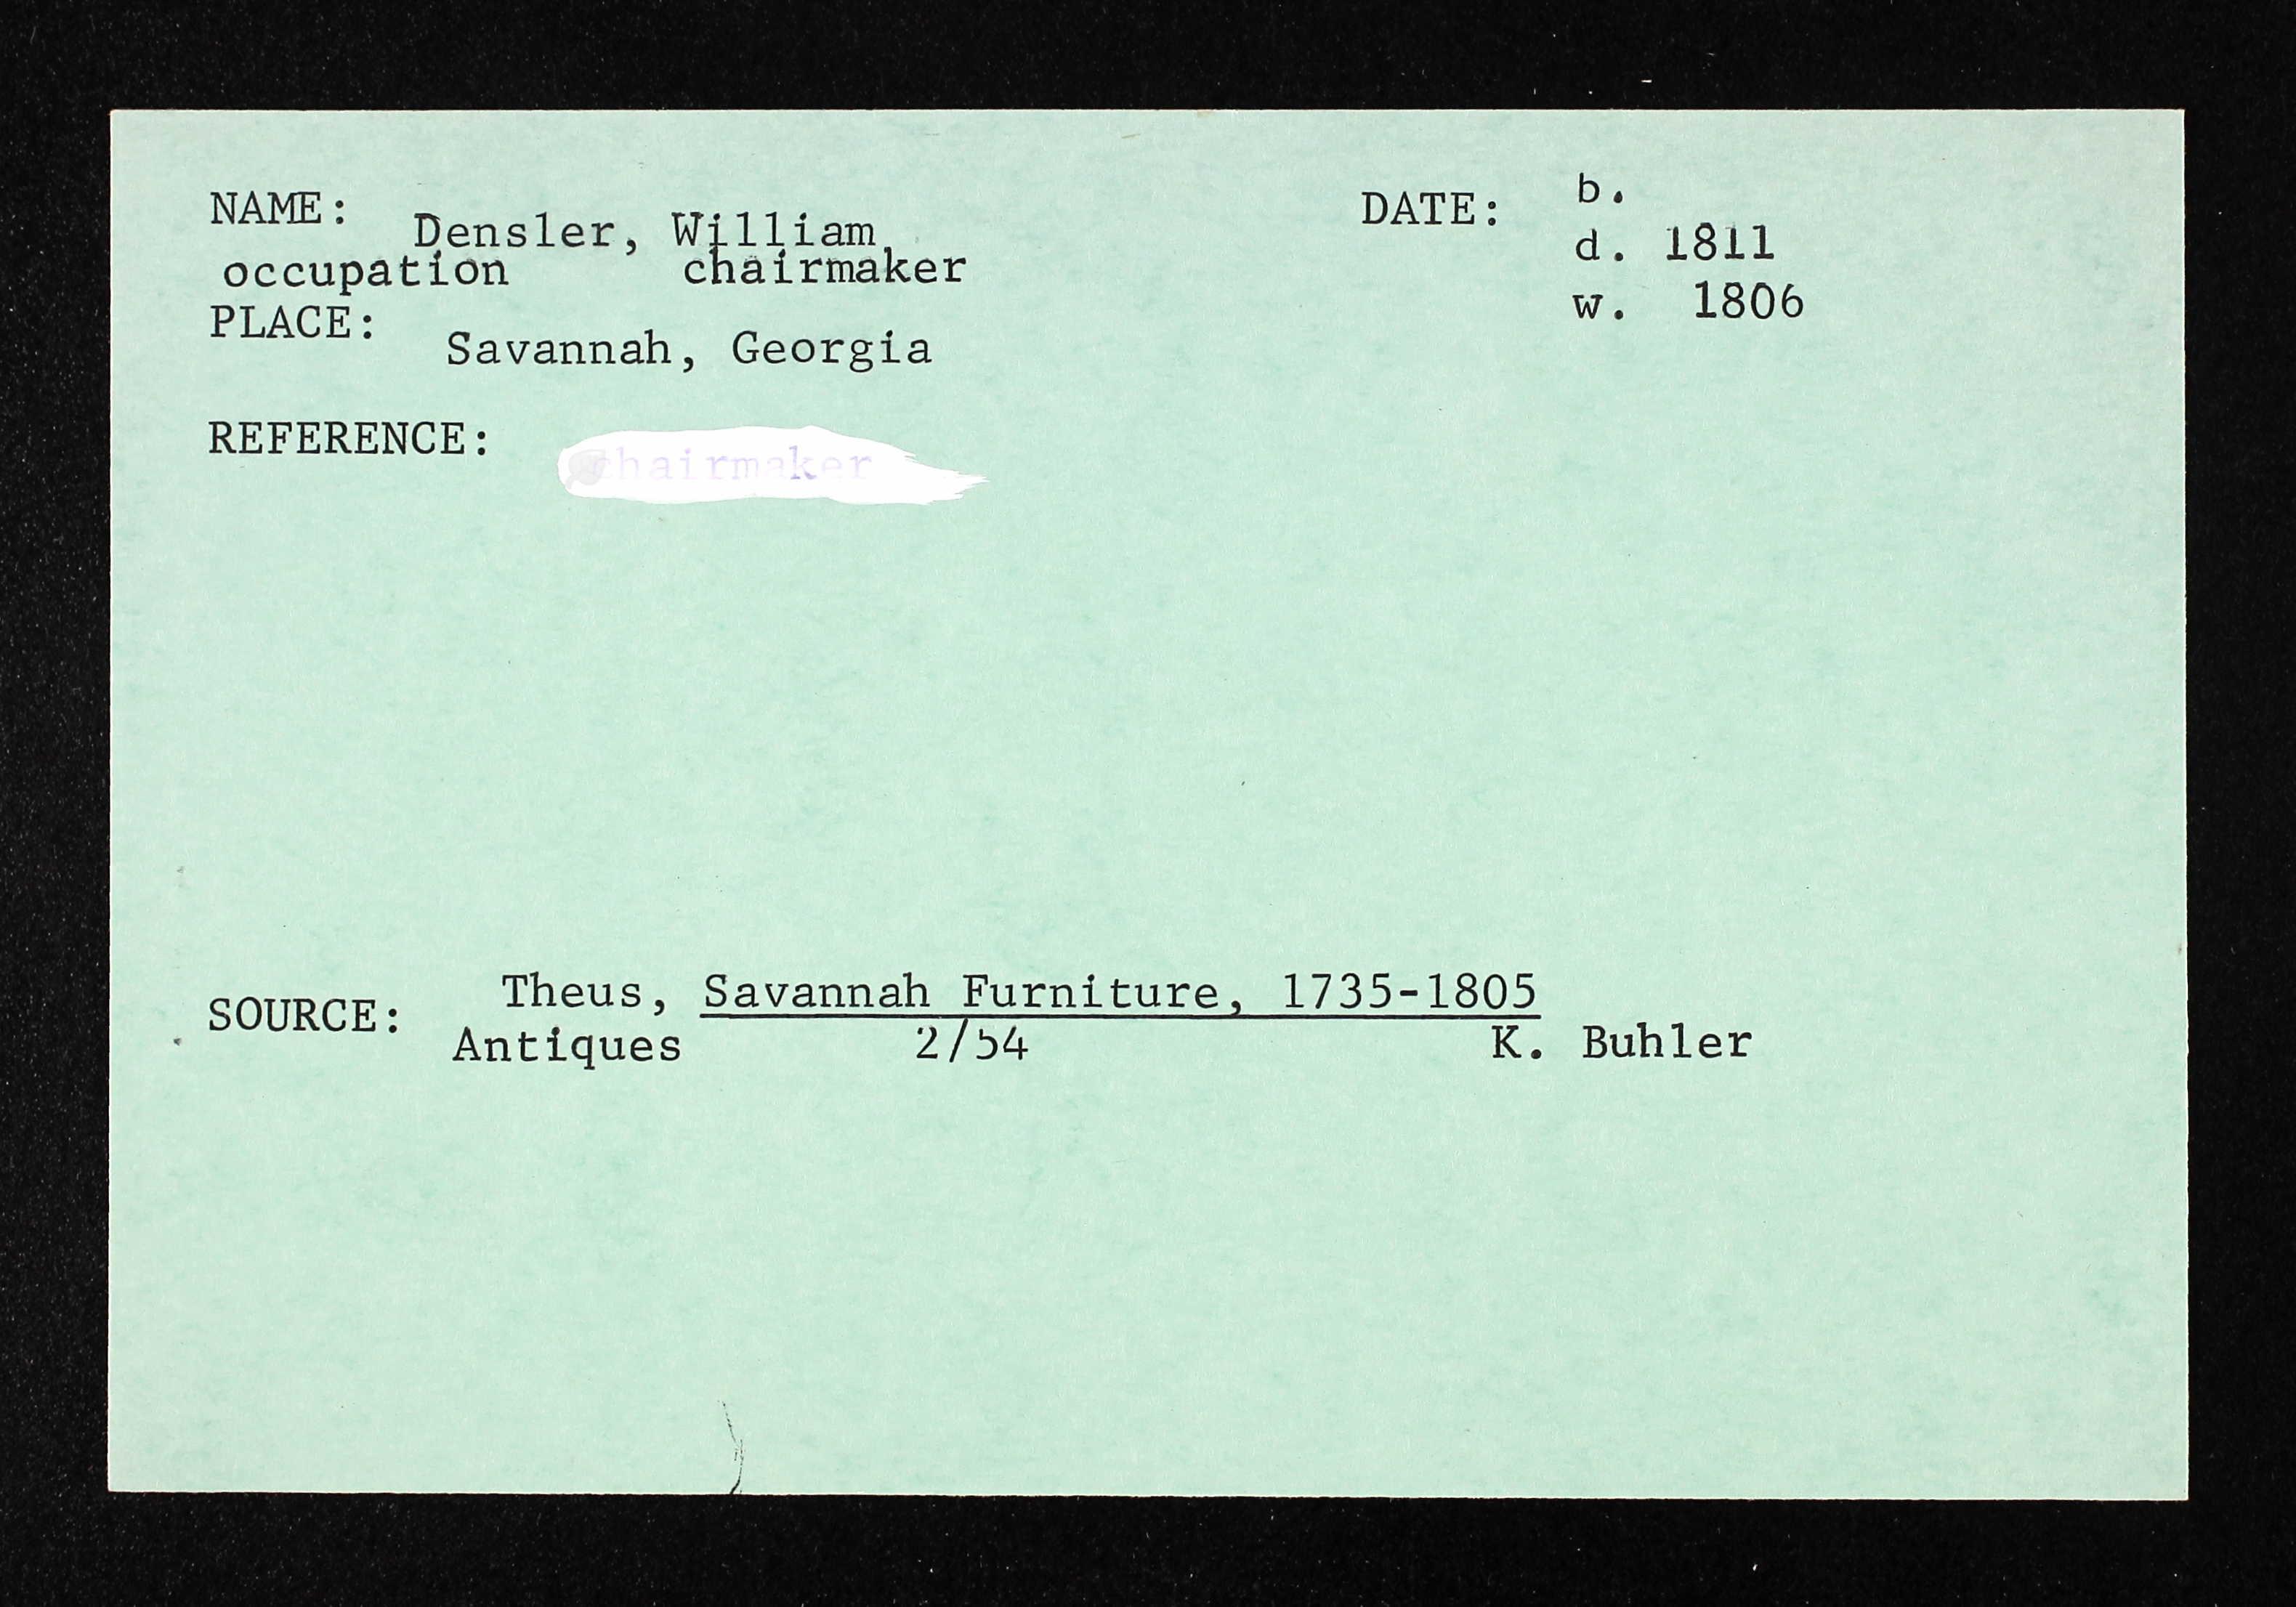 DenslerWilliam chairmaker 1806 note 1